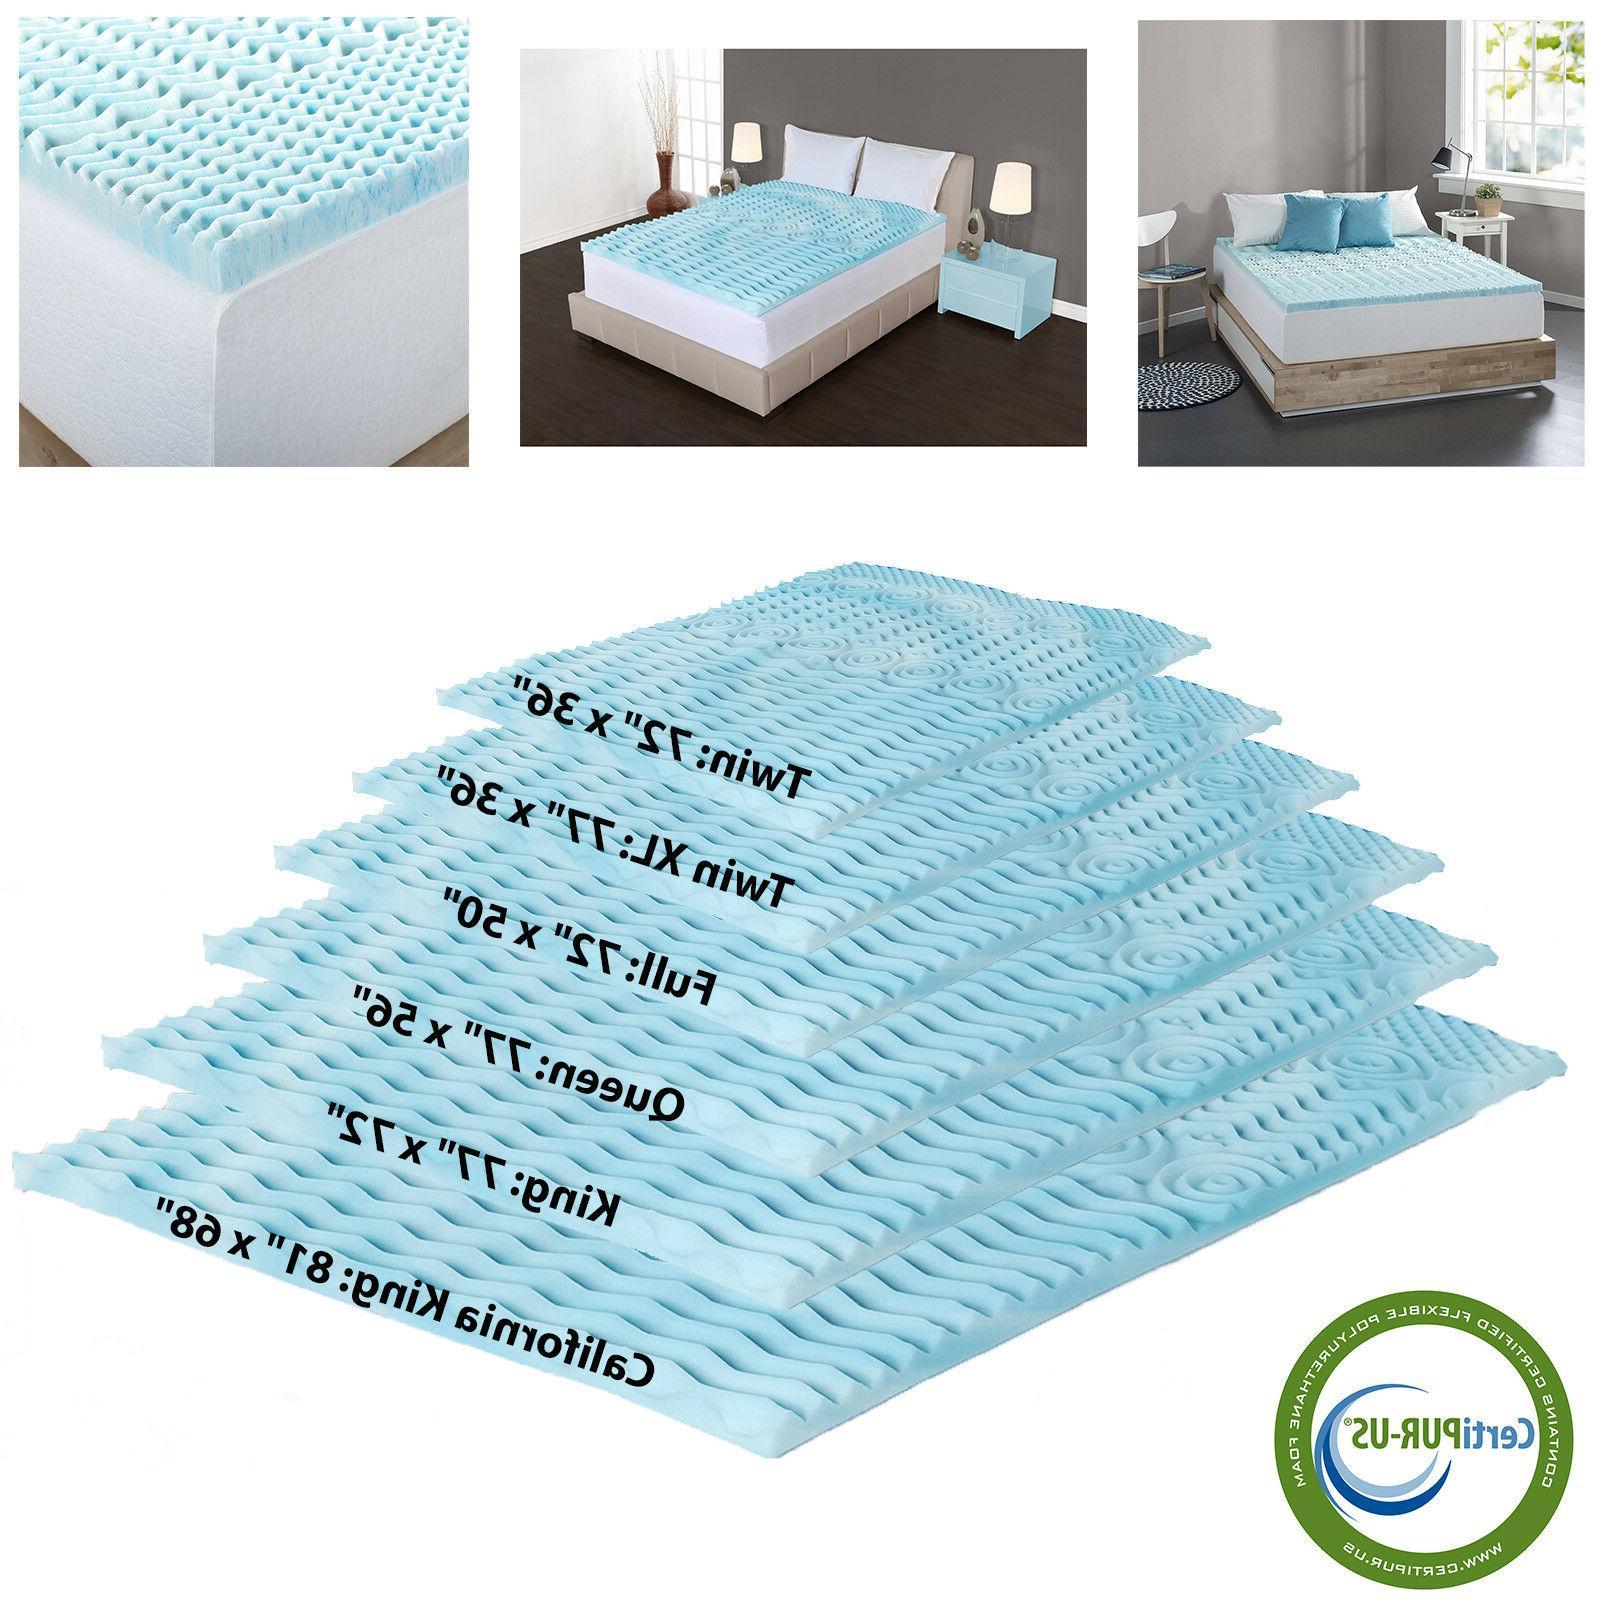 orthopedic bed pad 5 zone 2 inch